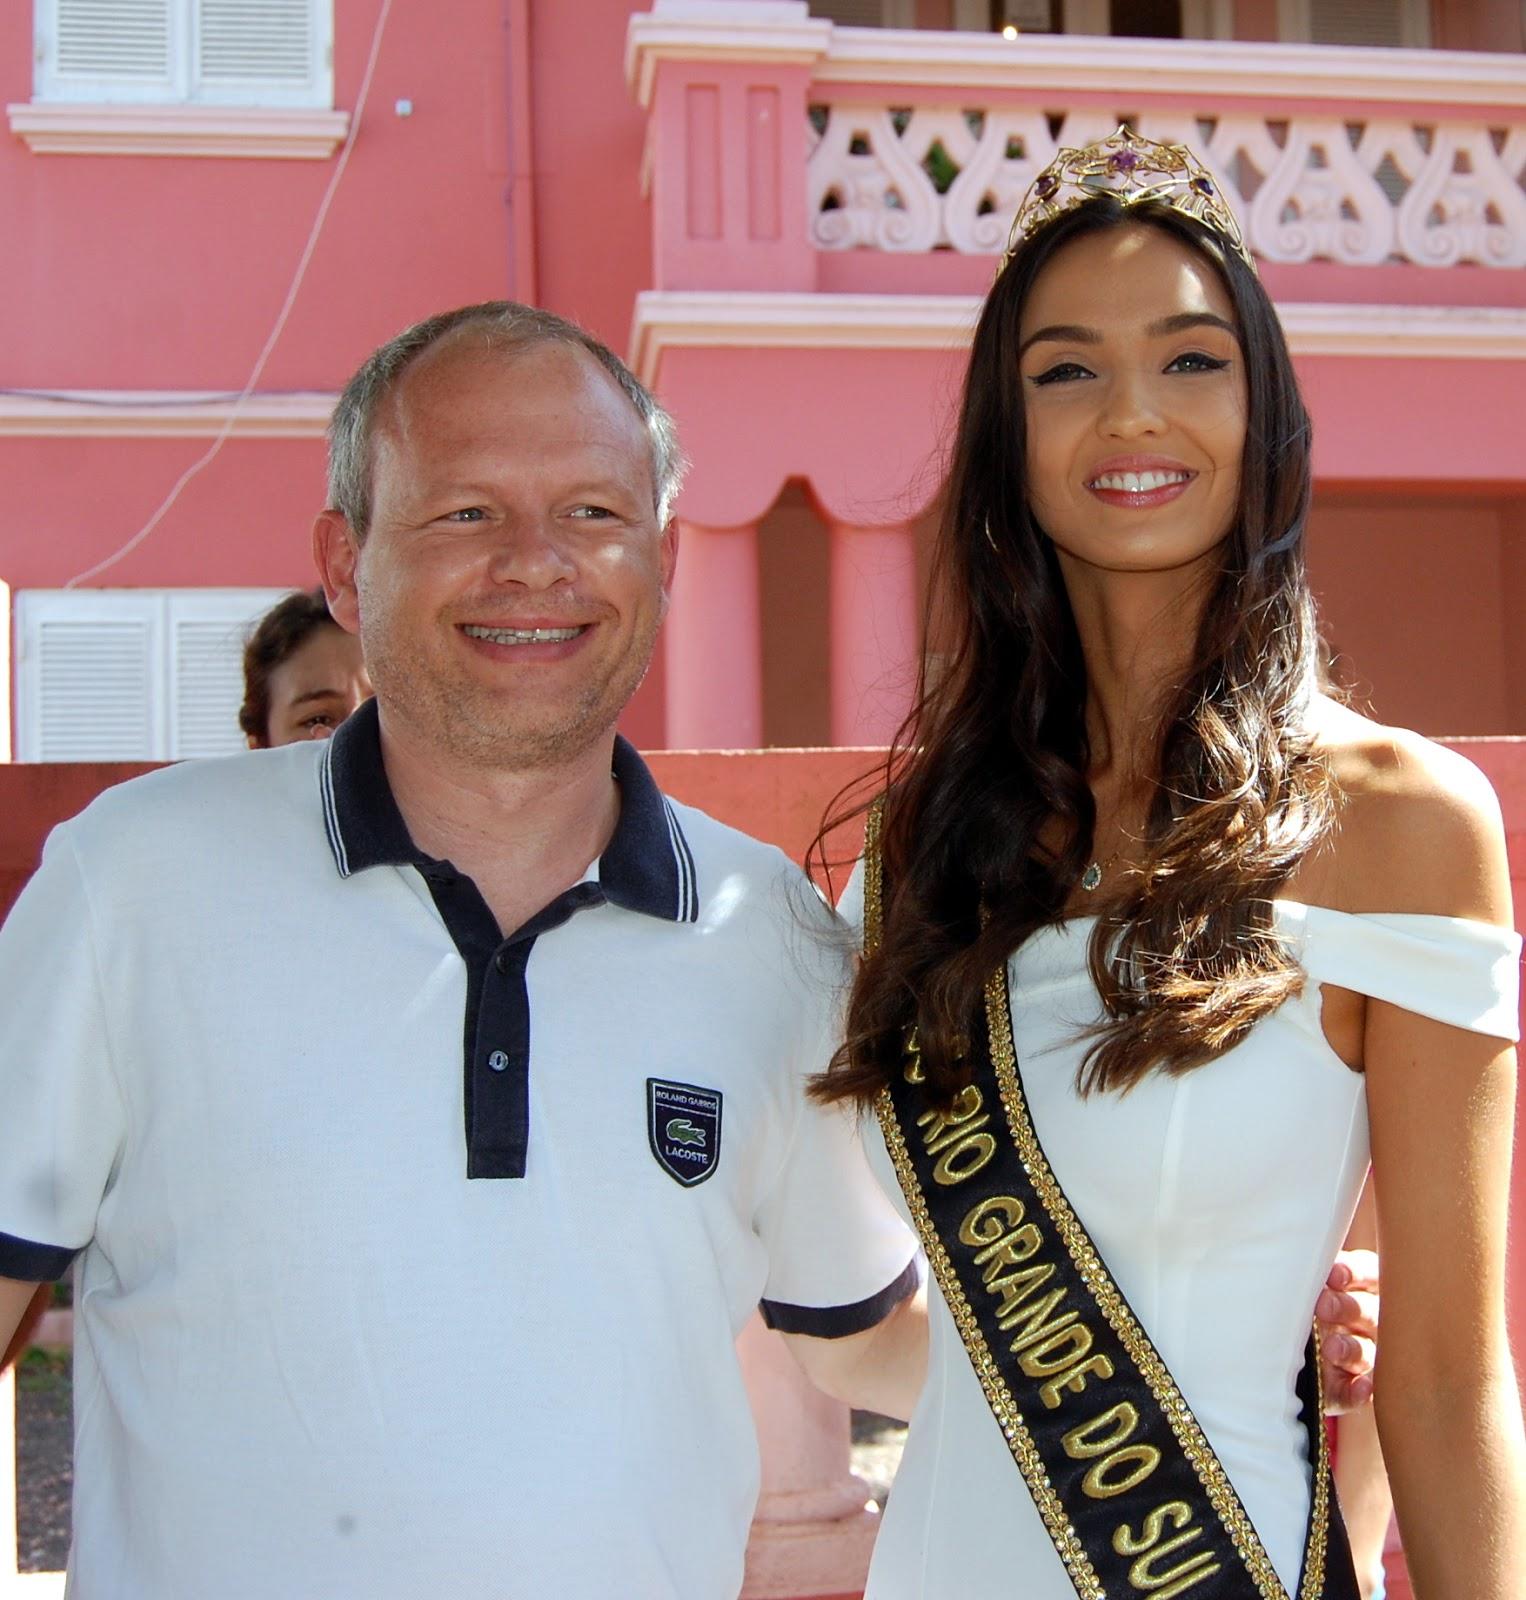 bianca scheren, top 5 de miss brasil universo 2019. - Página 5 Dsc_0024